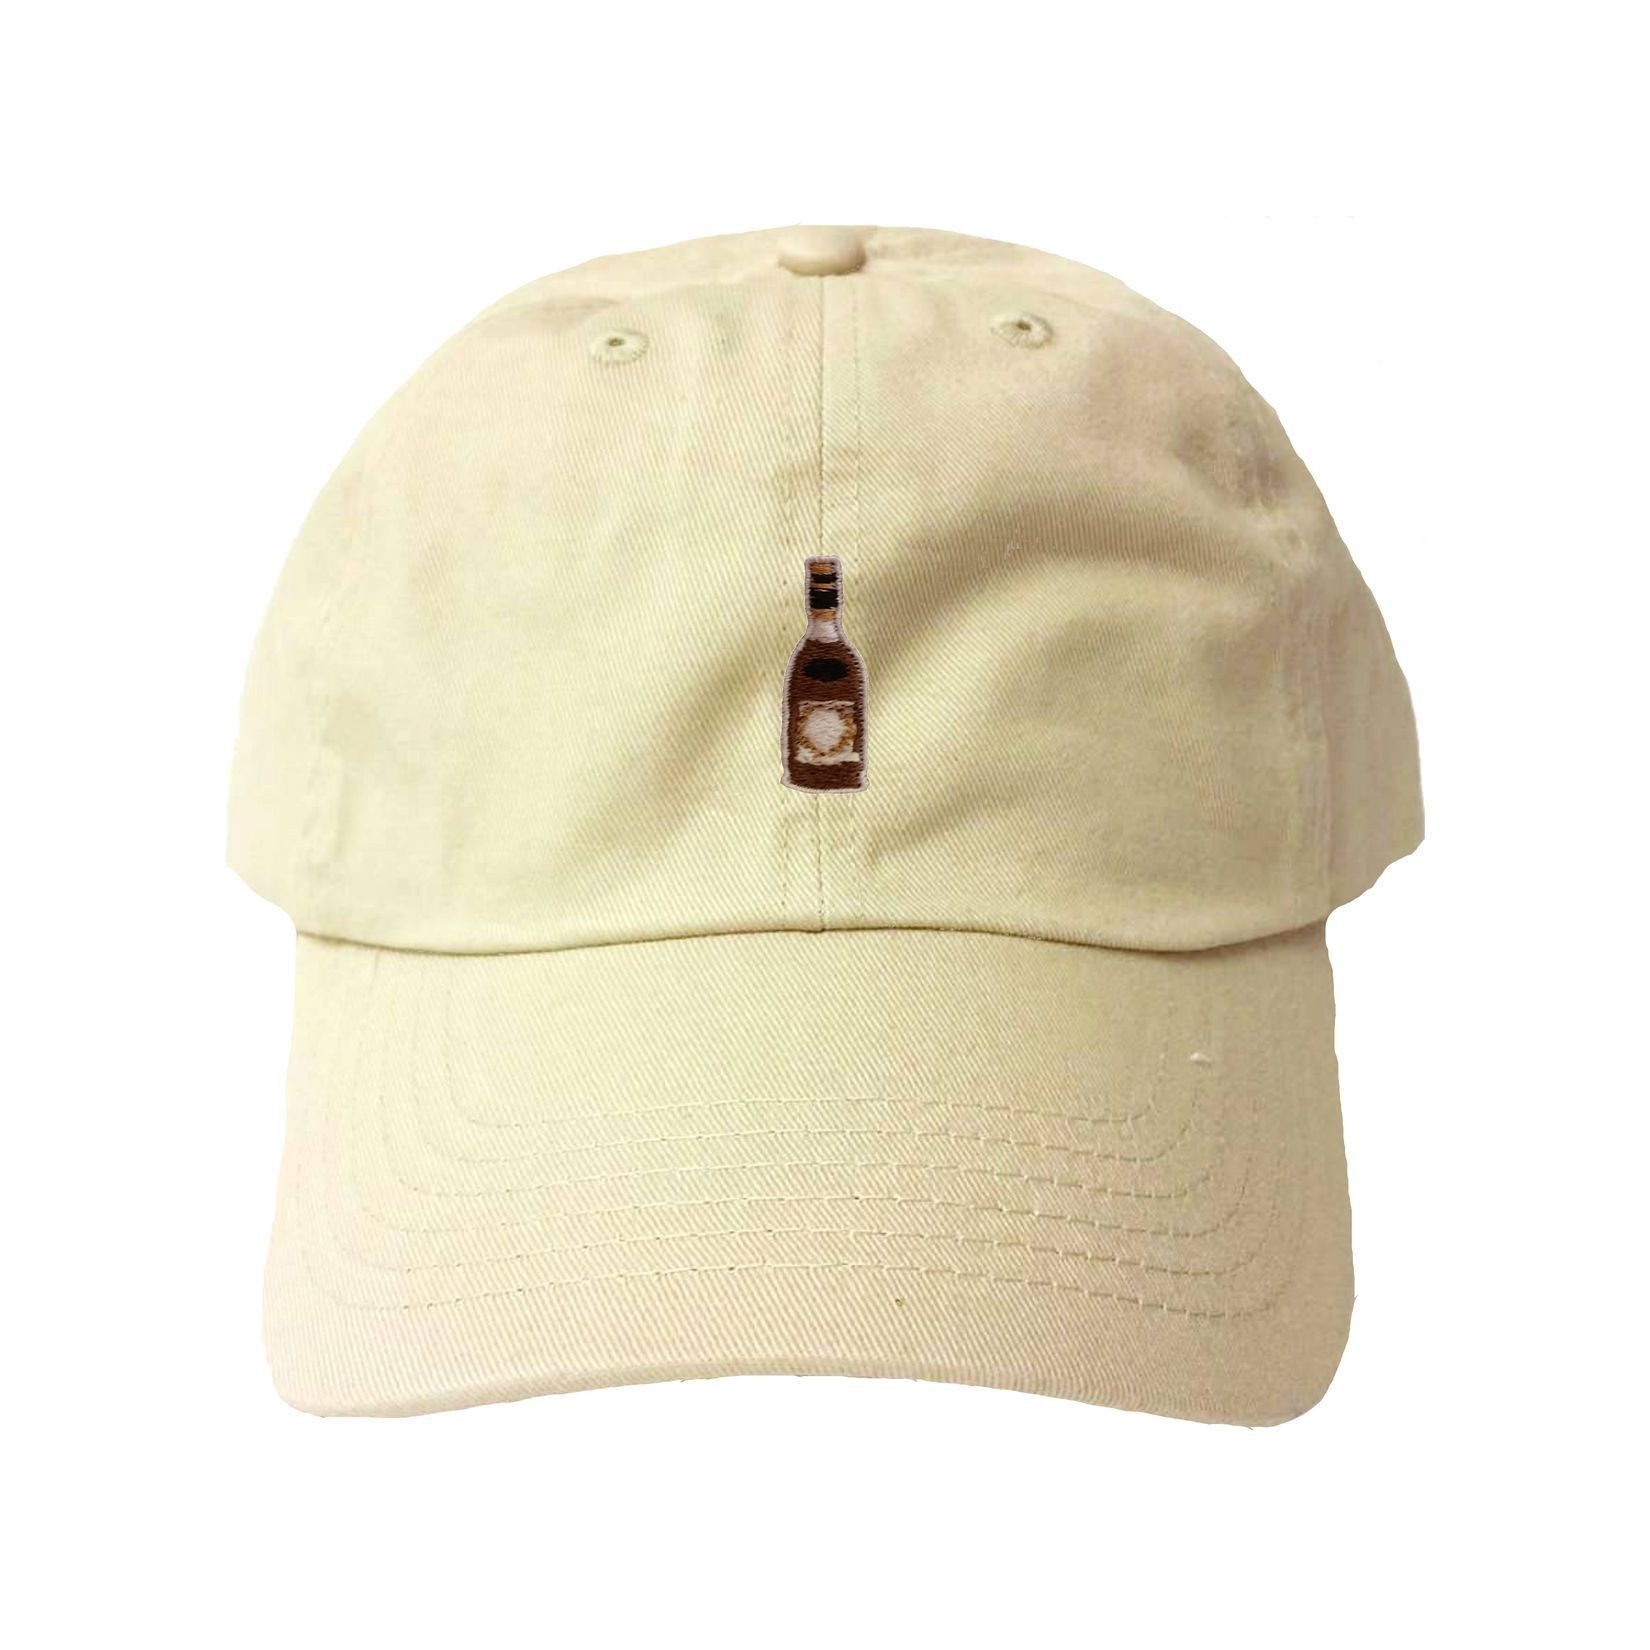 d7441add385 ... Squatch King Threads. Adult Henny Bottle Dad Hat Cap